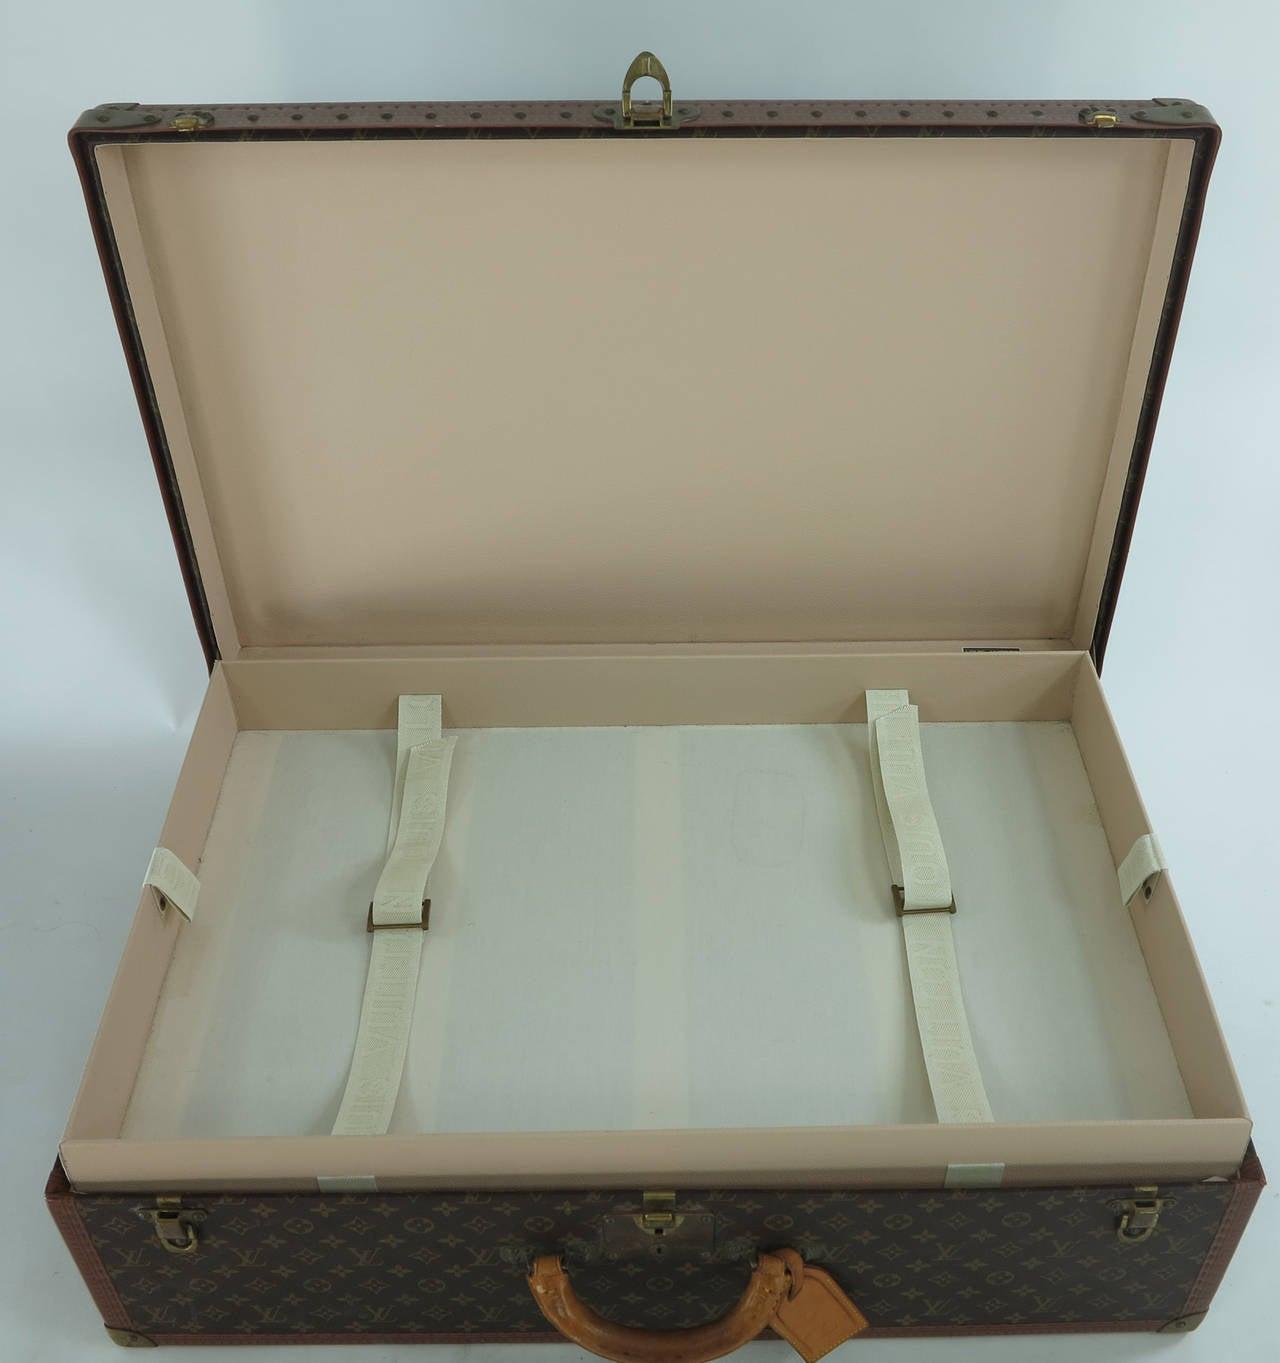 Louis Vuitton Alzar 80 monogram hardside suitcase/trunk 6